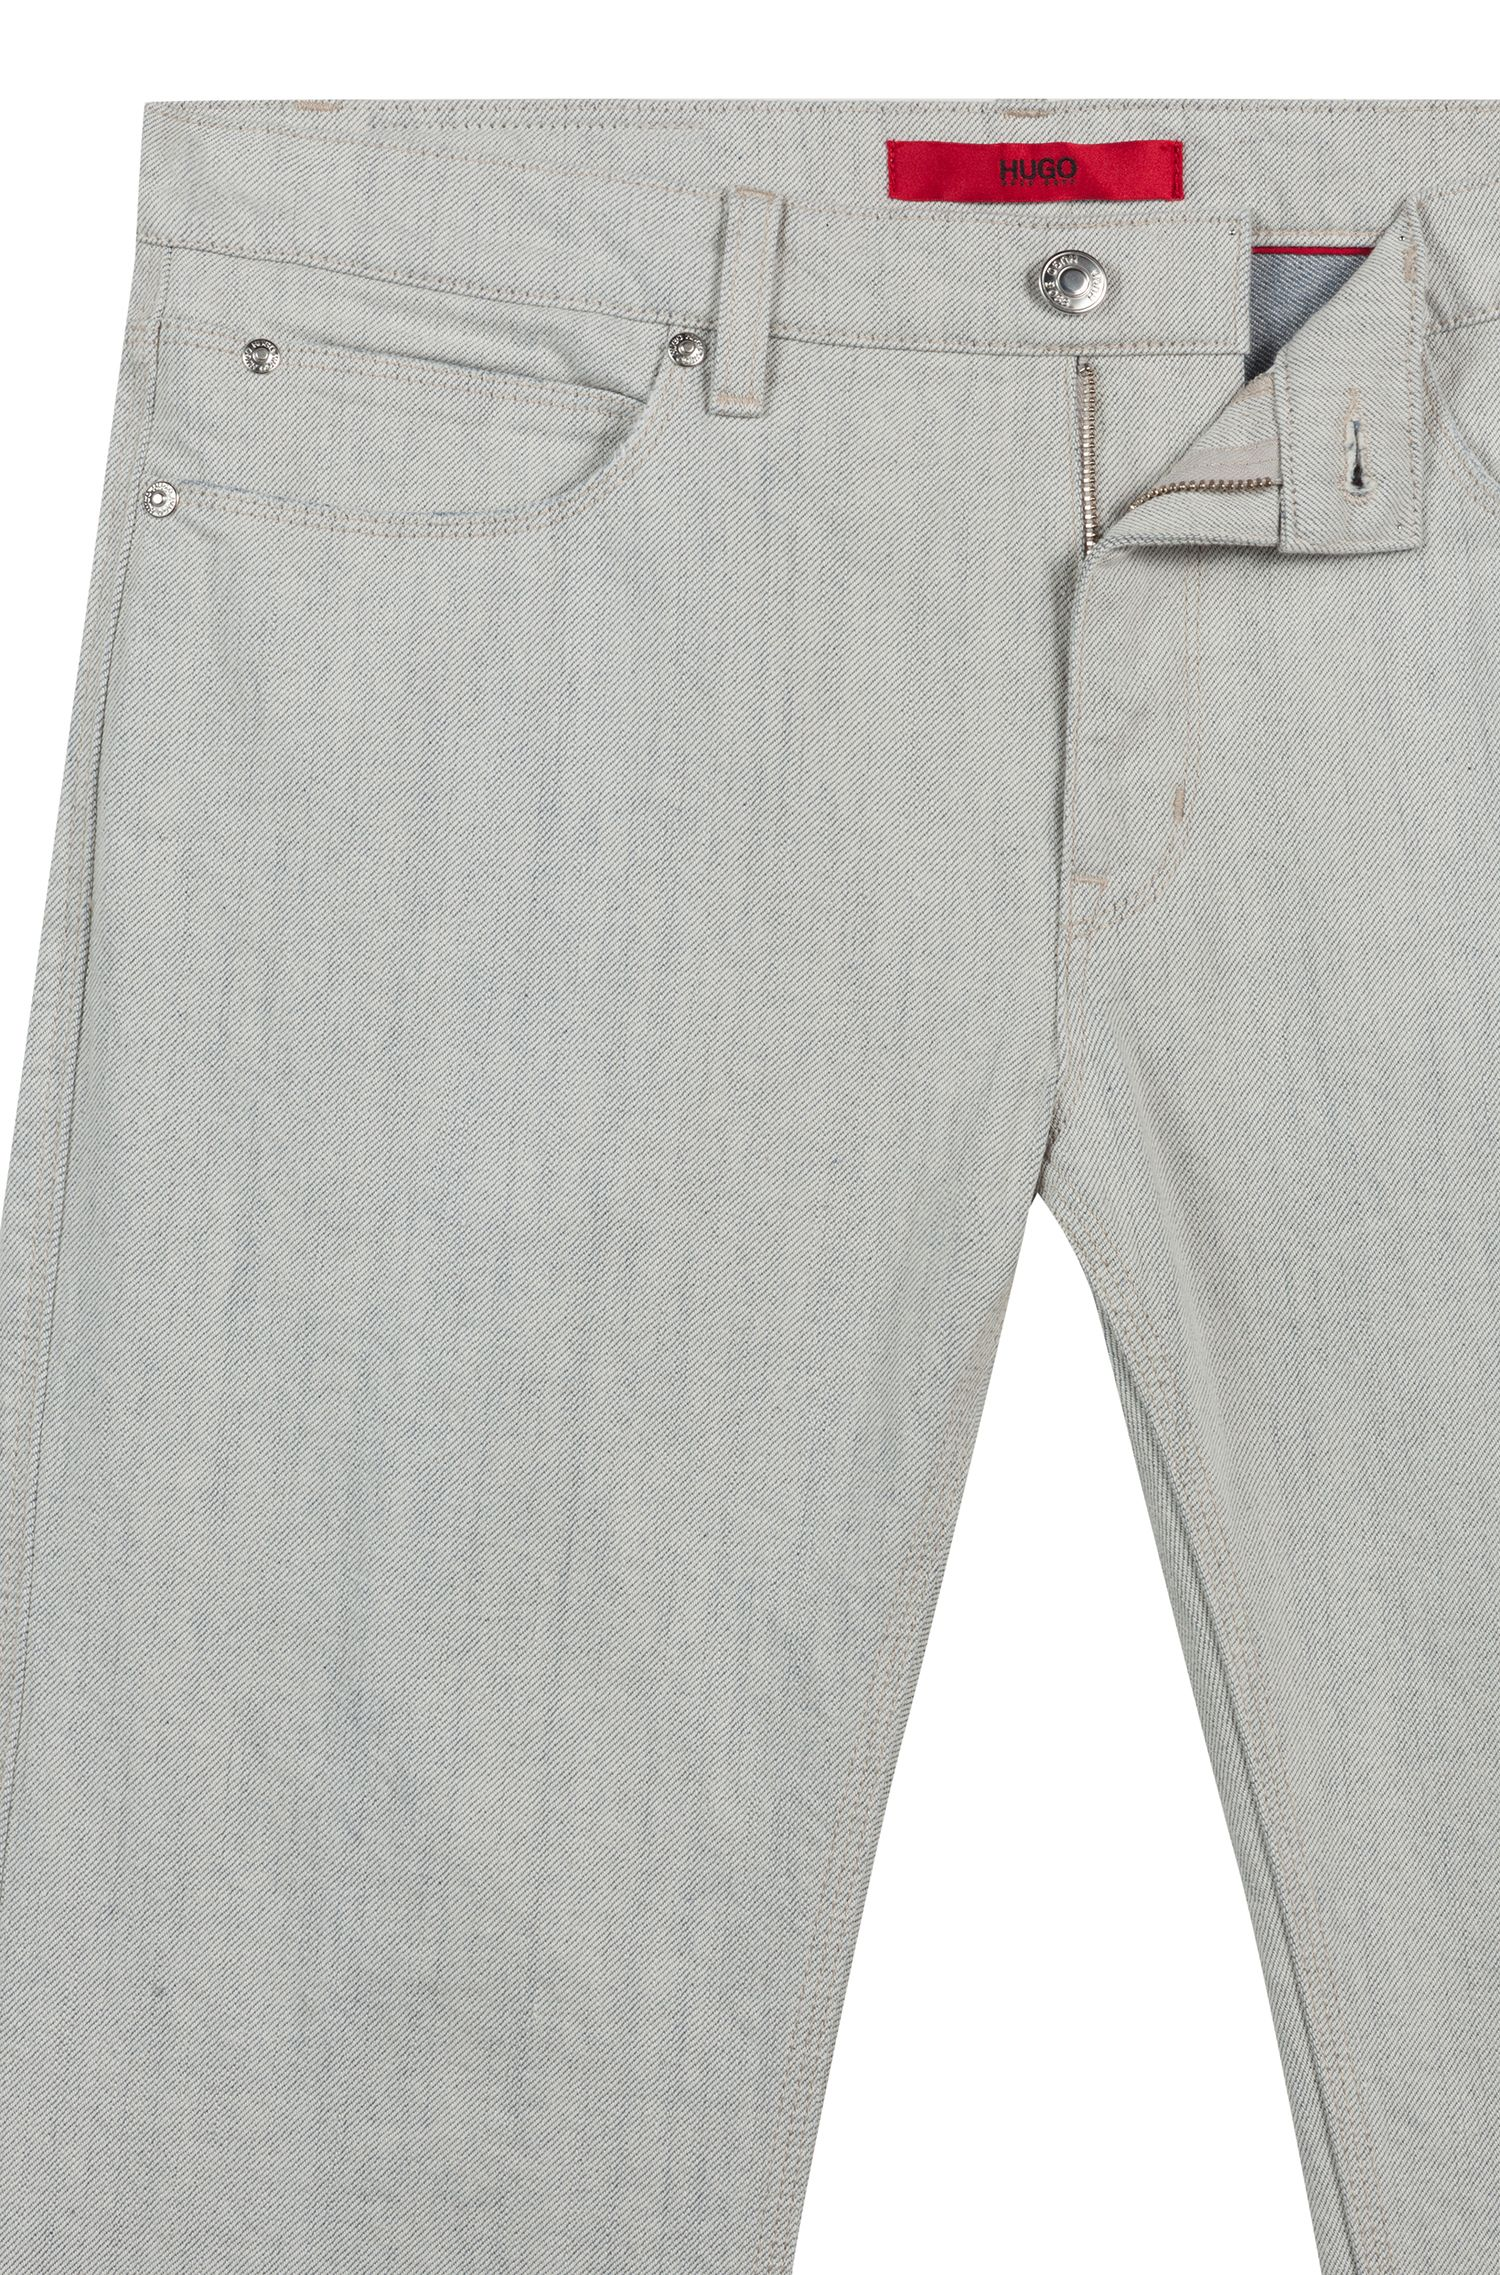 Slim-fit jeans in soft-washed light-gray denim, Natural